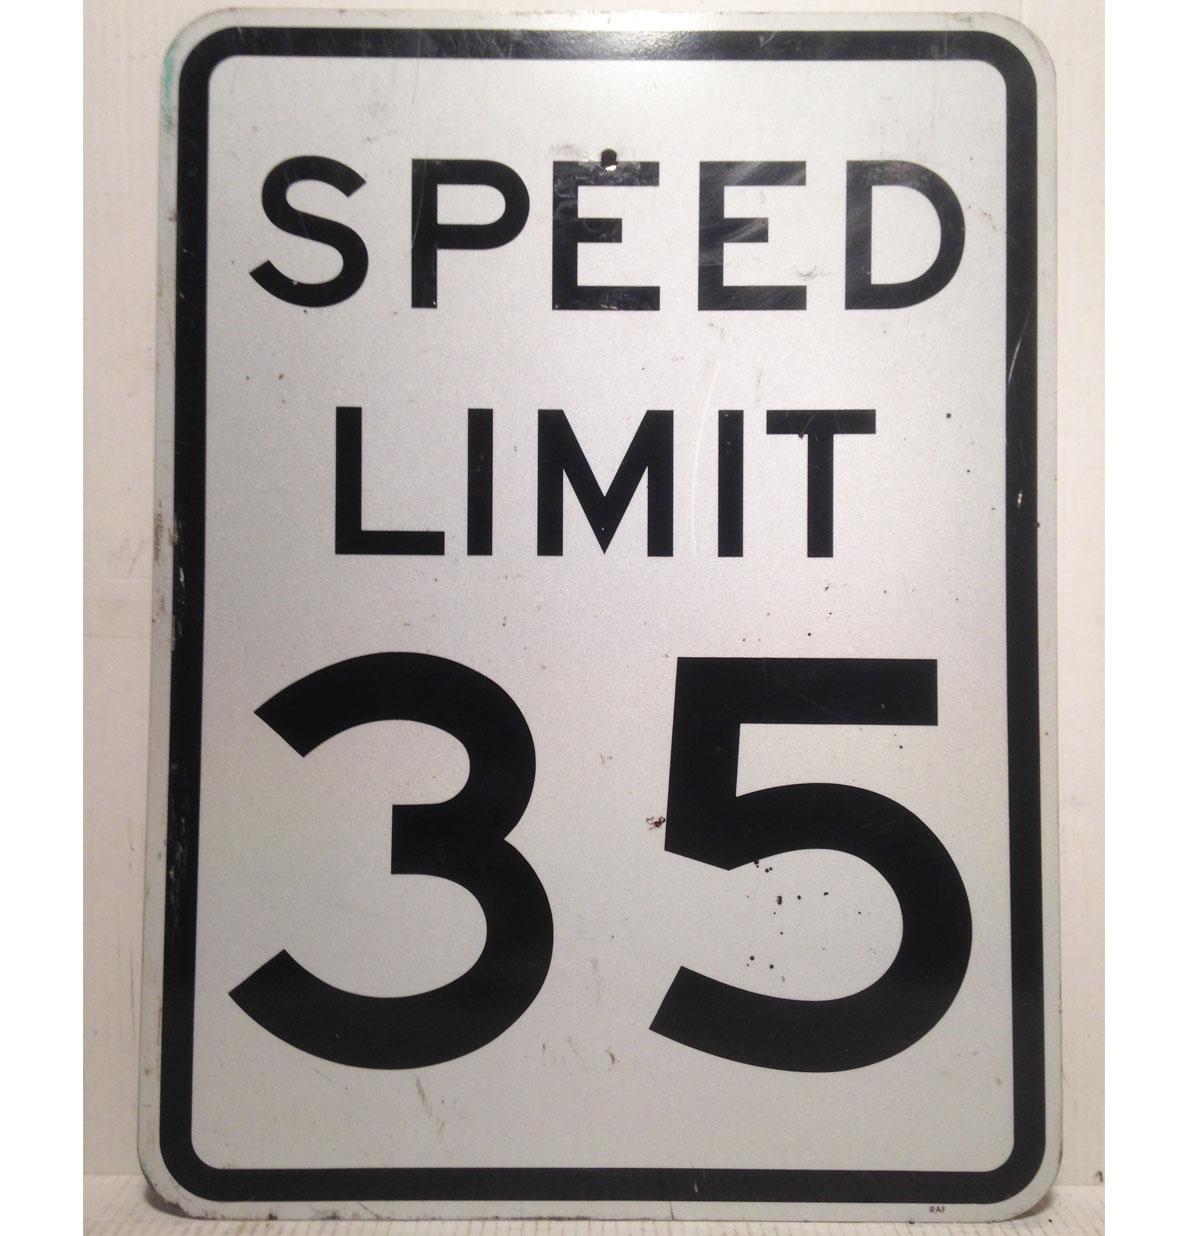 Speed Limit 35 Straat Bord - Origineel 61 x 76 cm